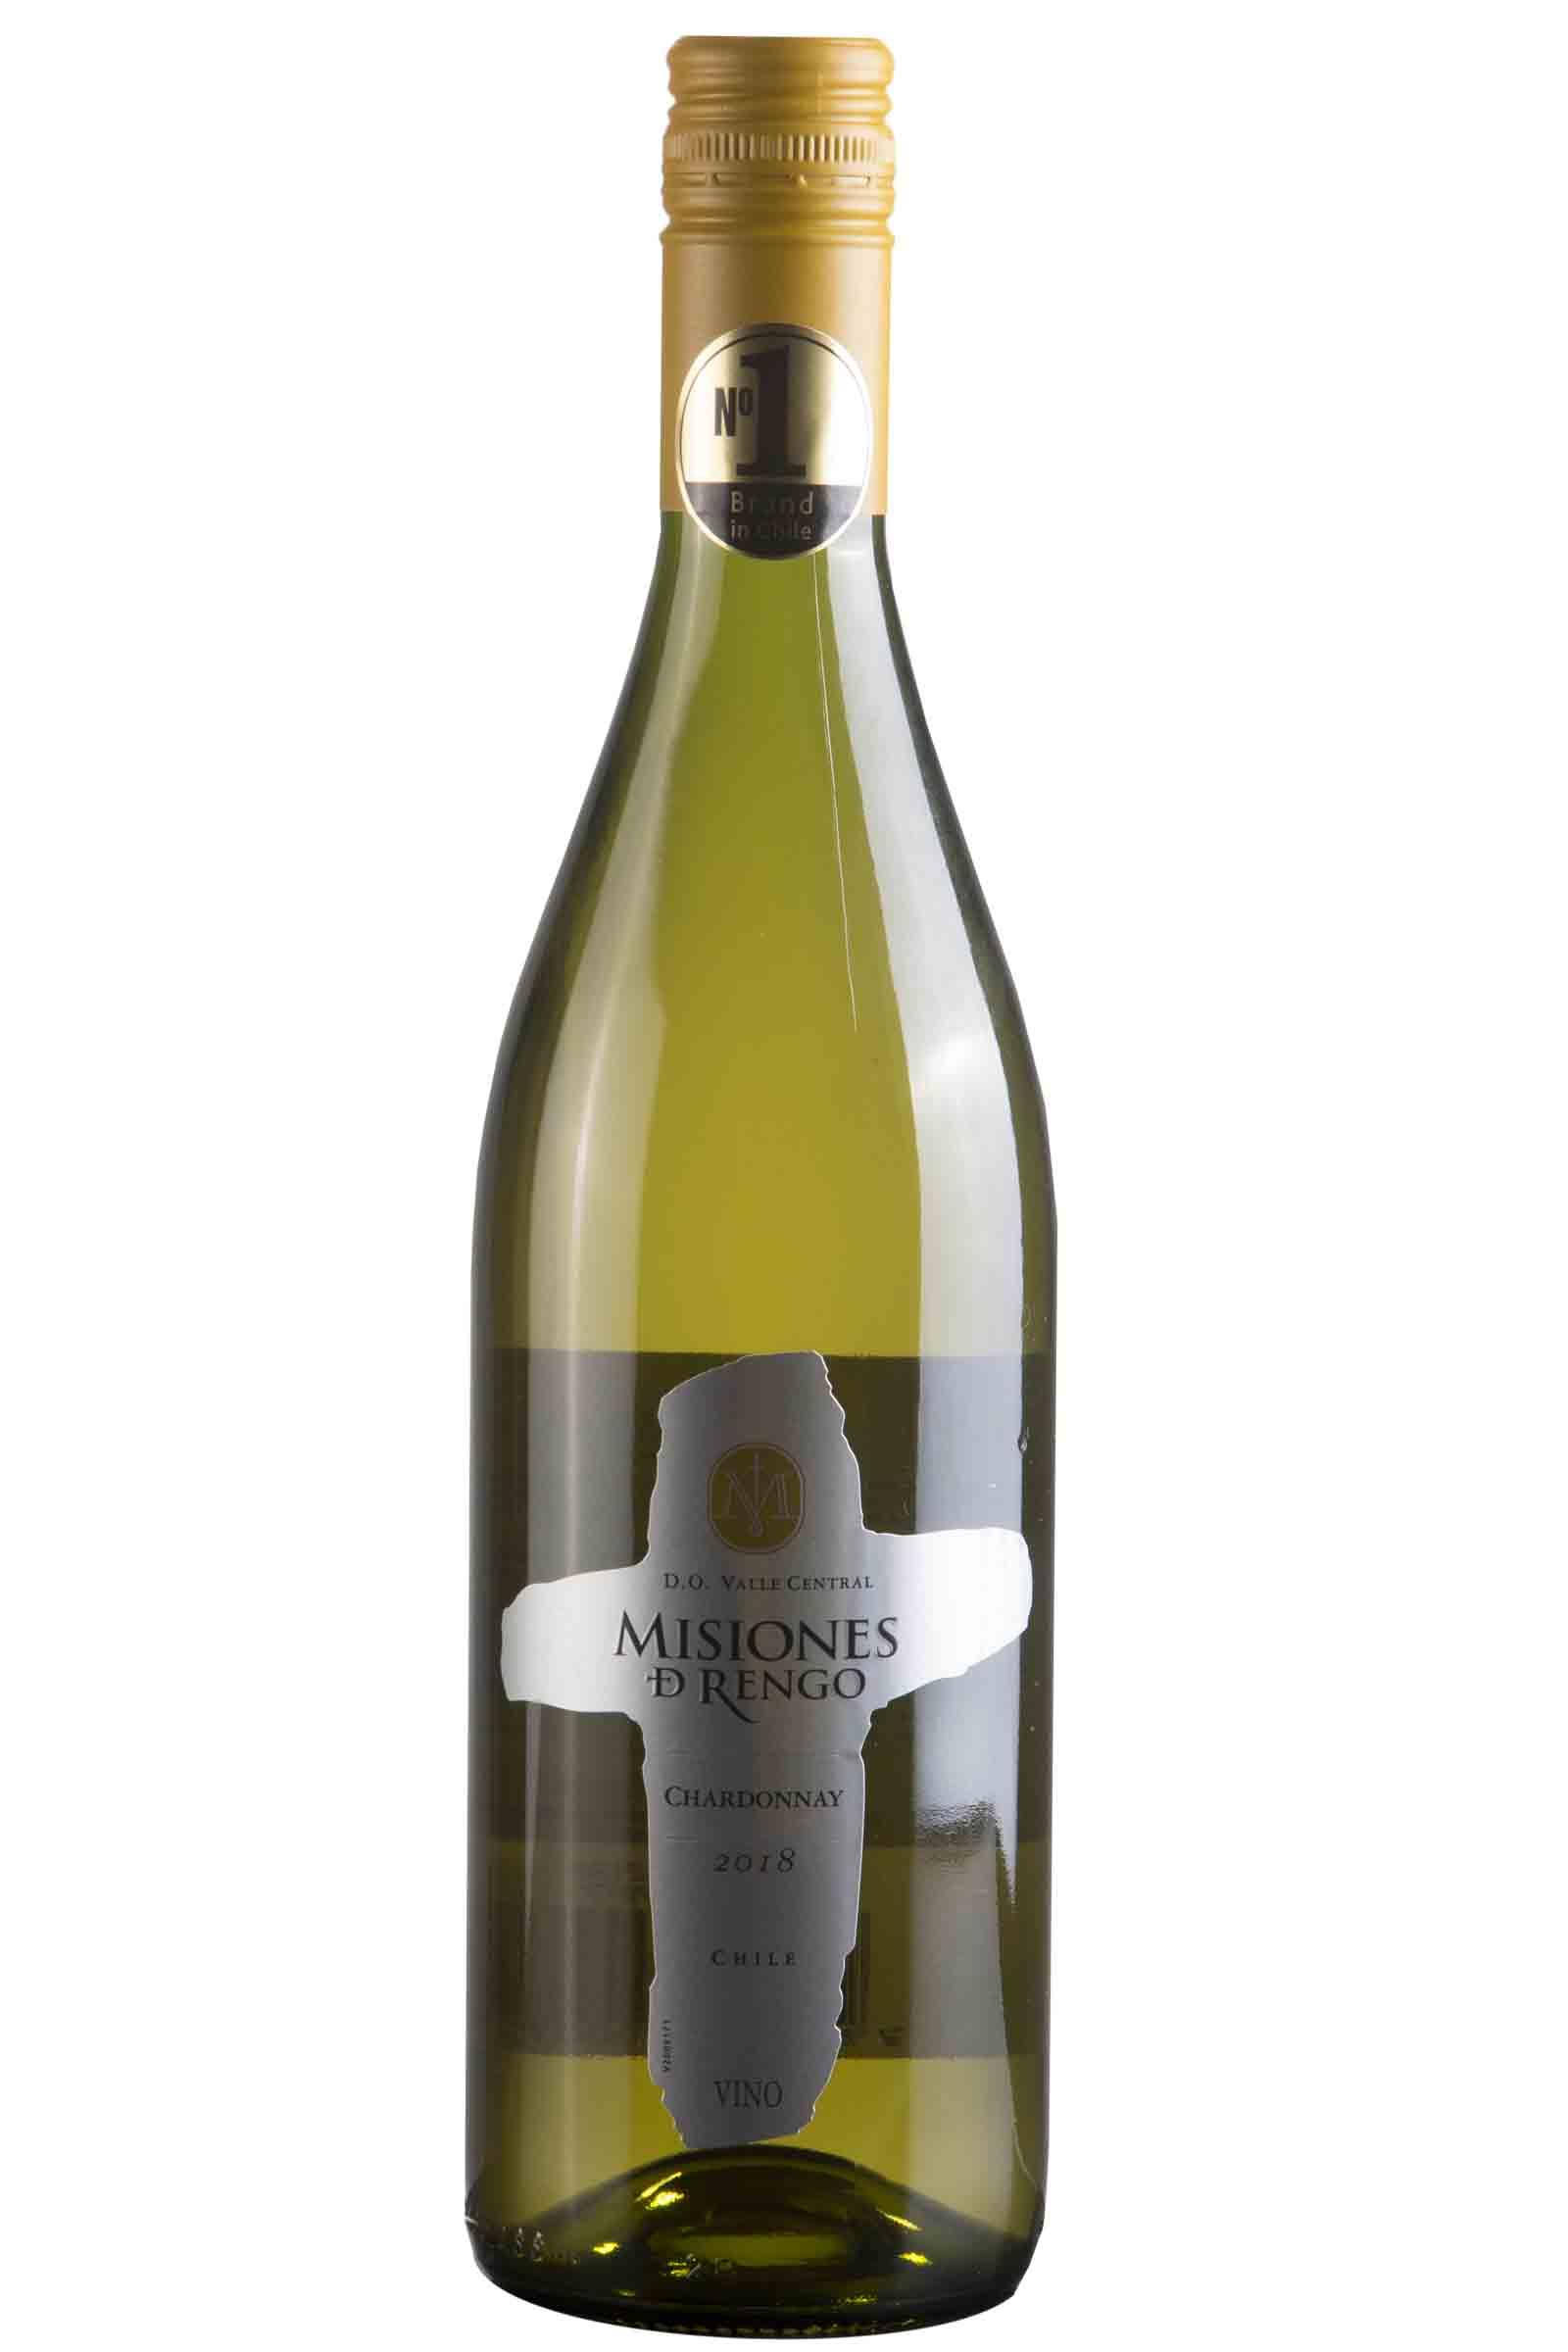 Vino Misiones de Rengo Varietal Chardonnay 750ml